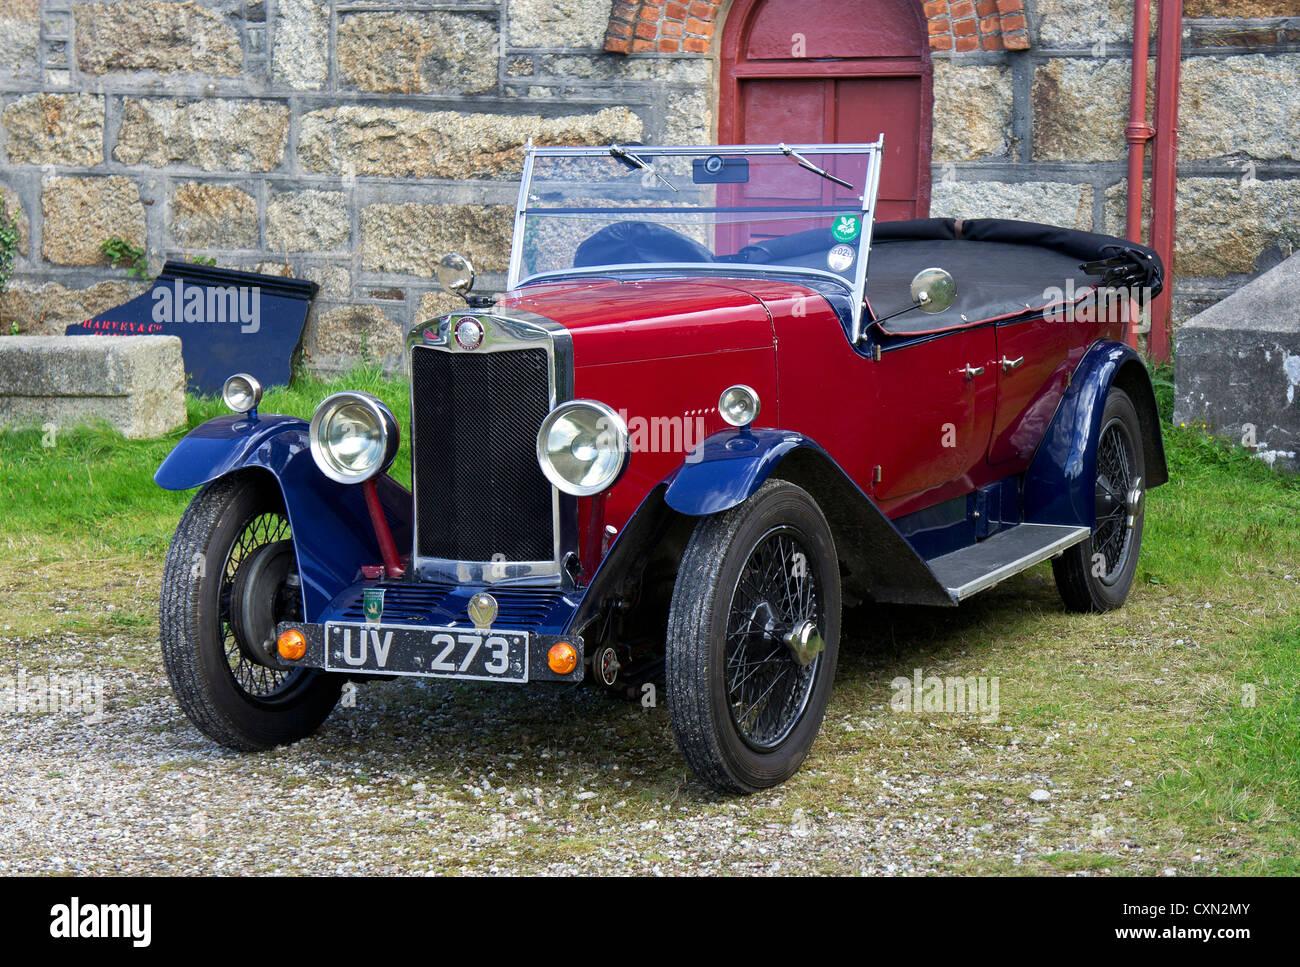 A vintage Lea-Francis motor car - Stock Image